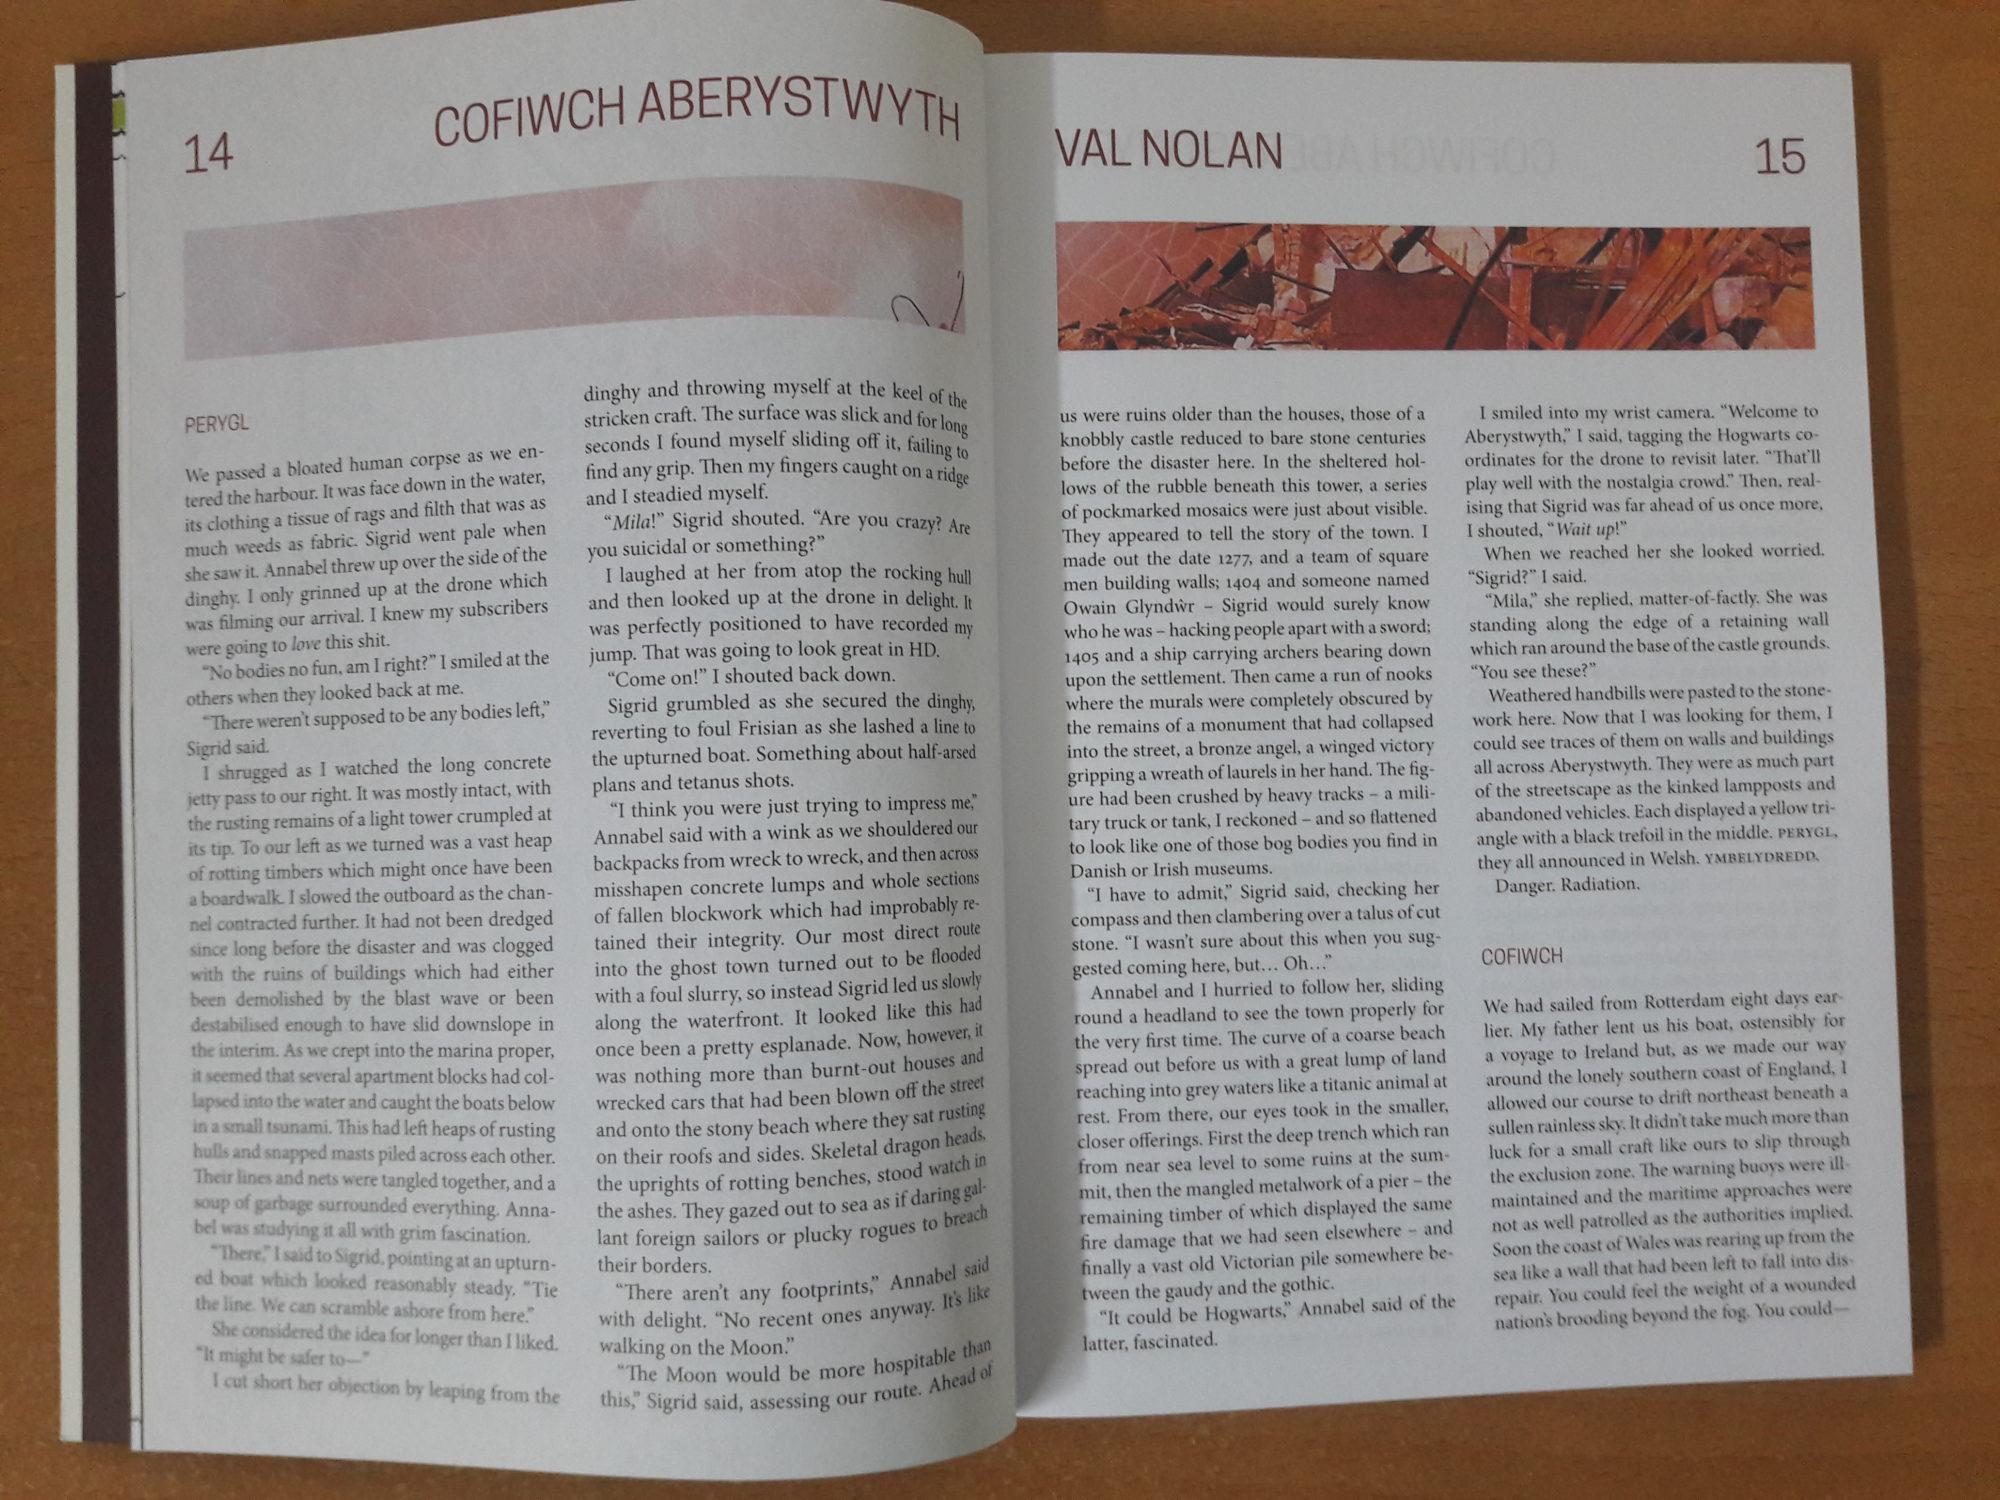 Interzone issue # 286 Review Cofiwch Aberystwyth by Val Nolan